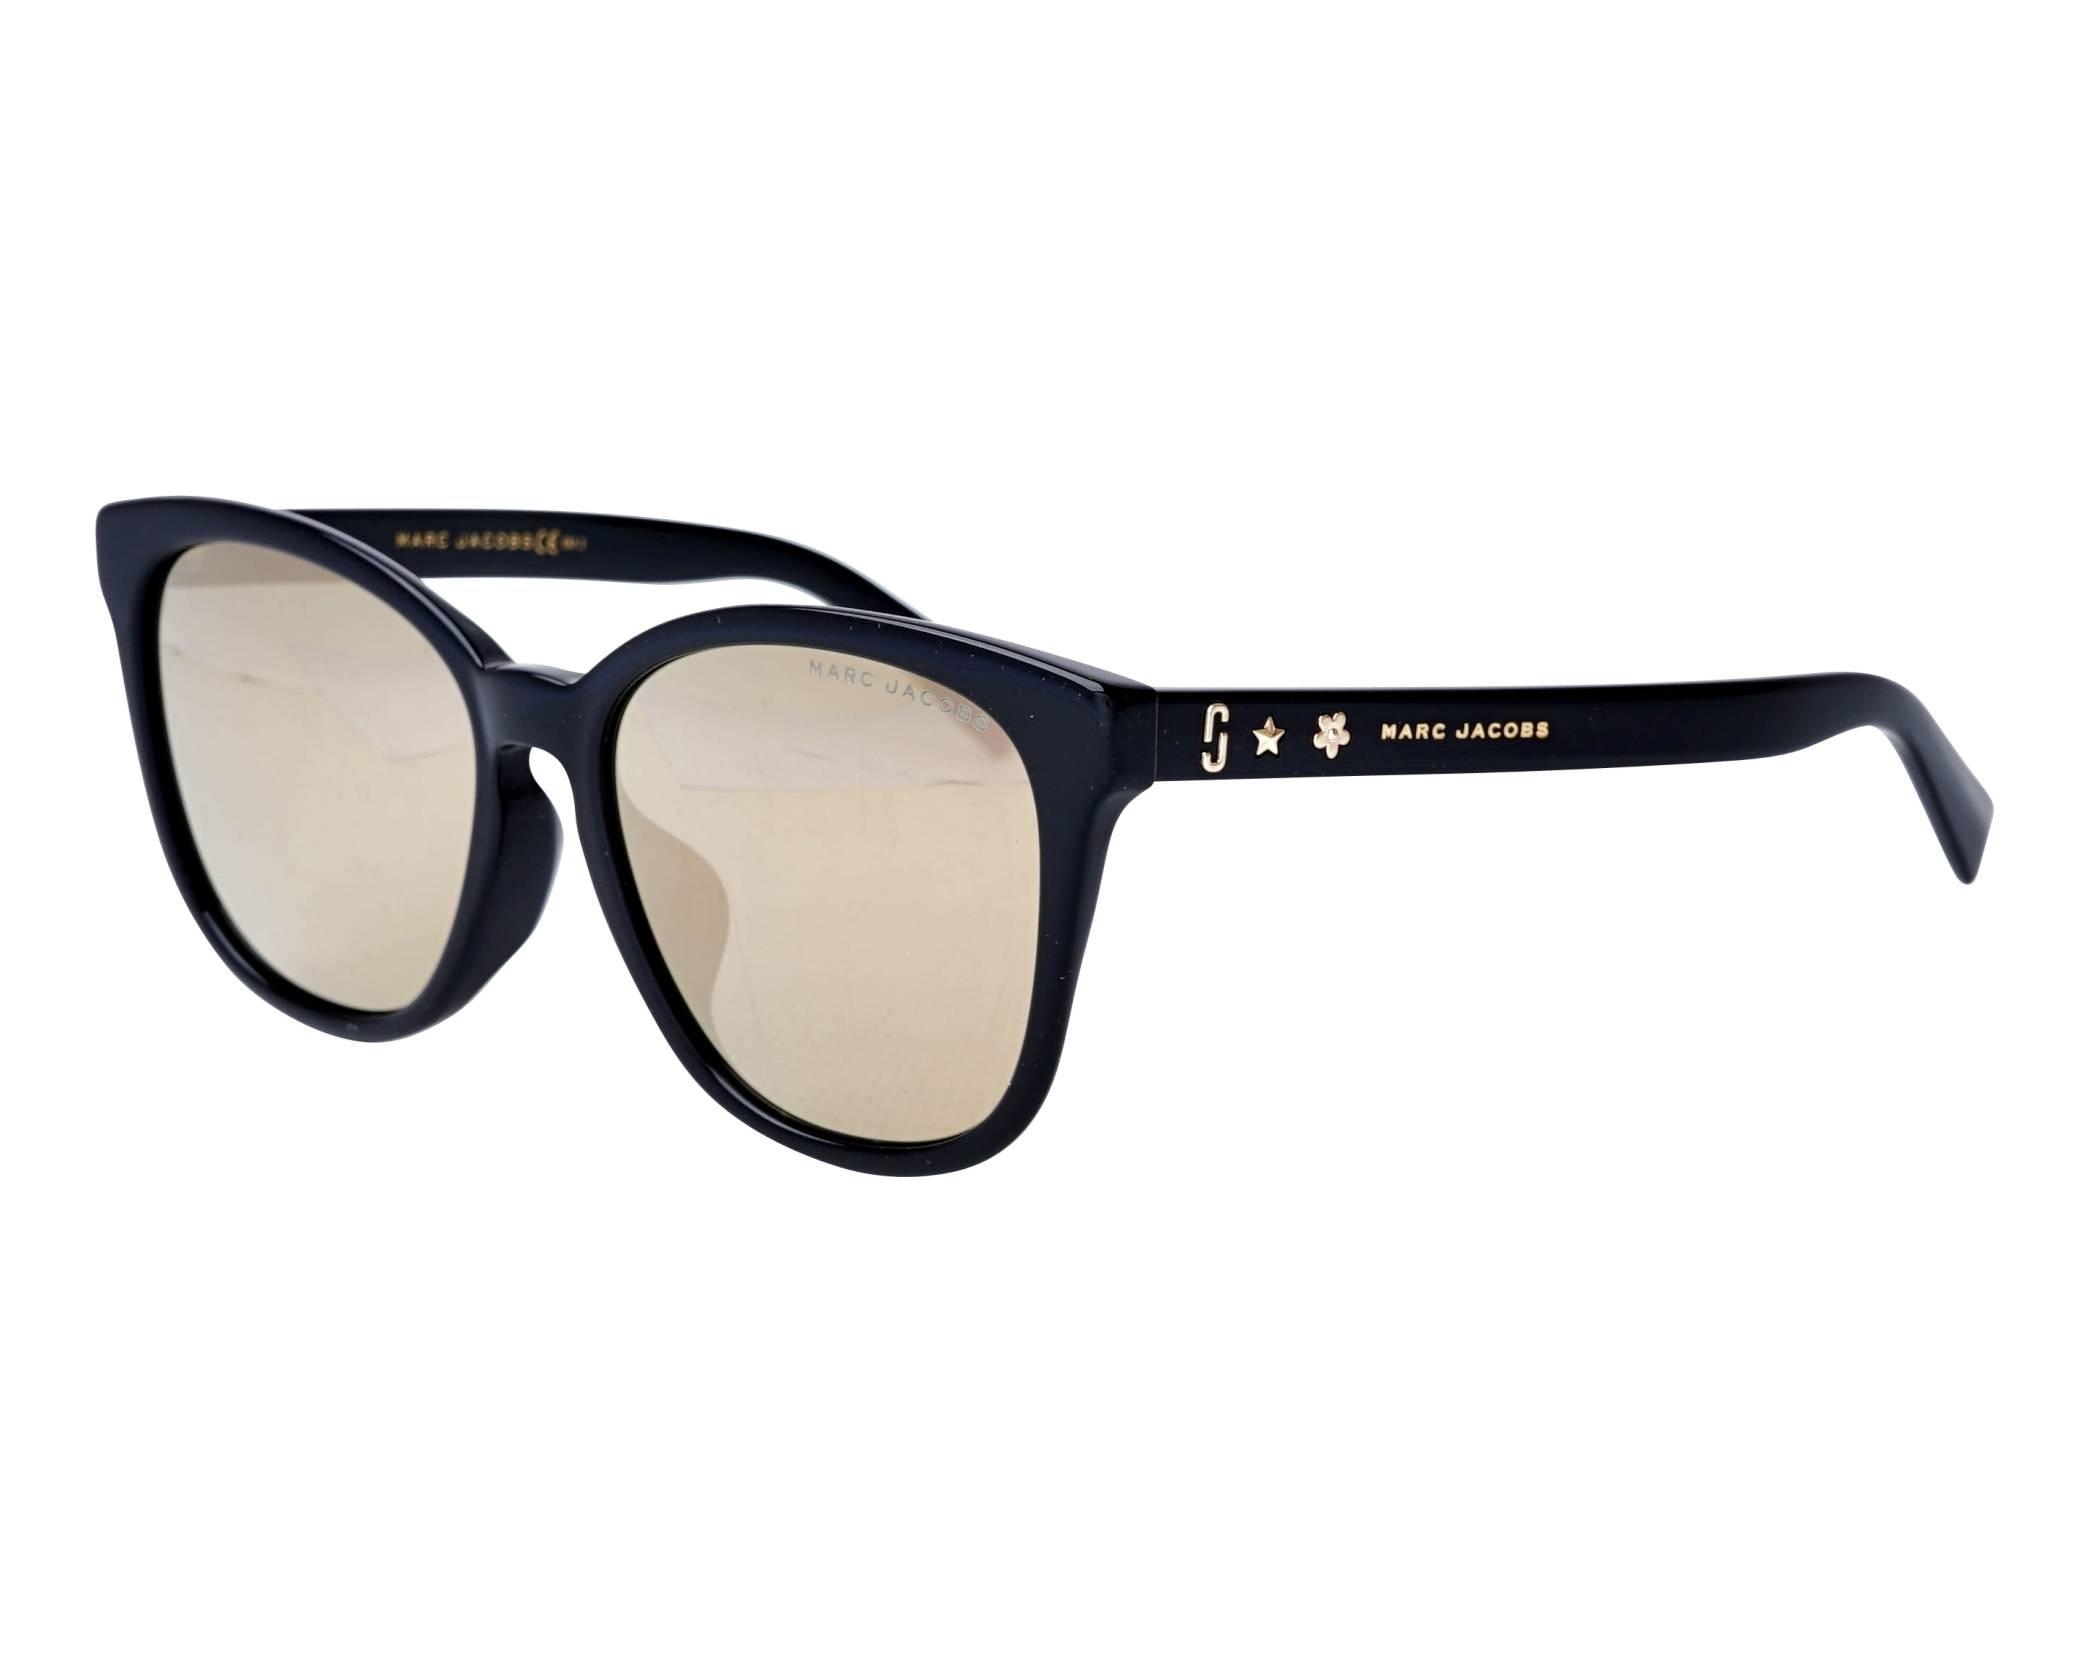 Sunglasses Marc Jacobs MARC-345-F-S 807UE 55-17 Black profile view a8a357ad278